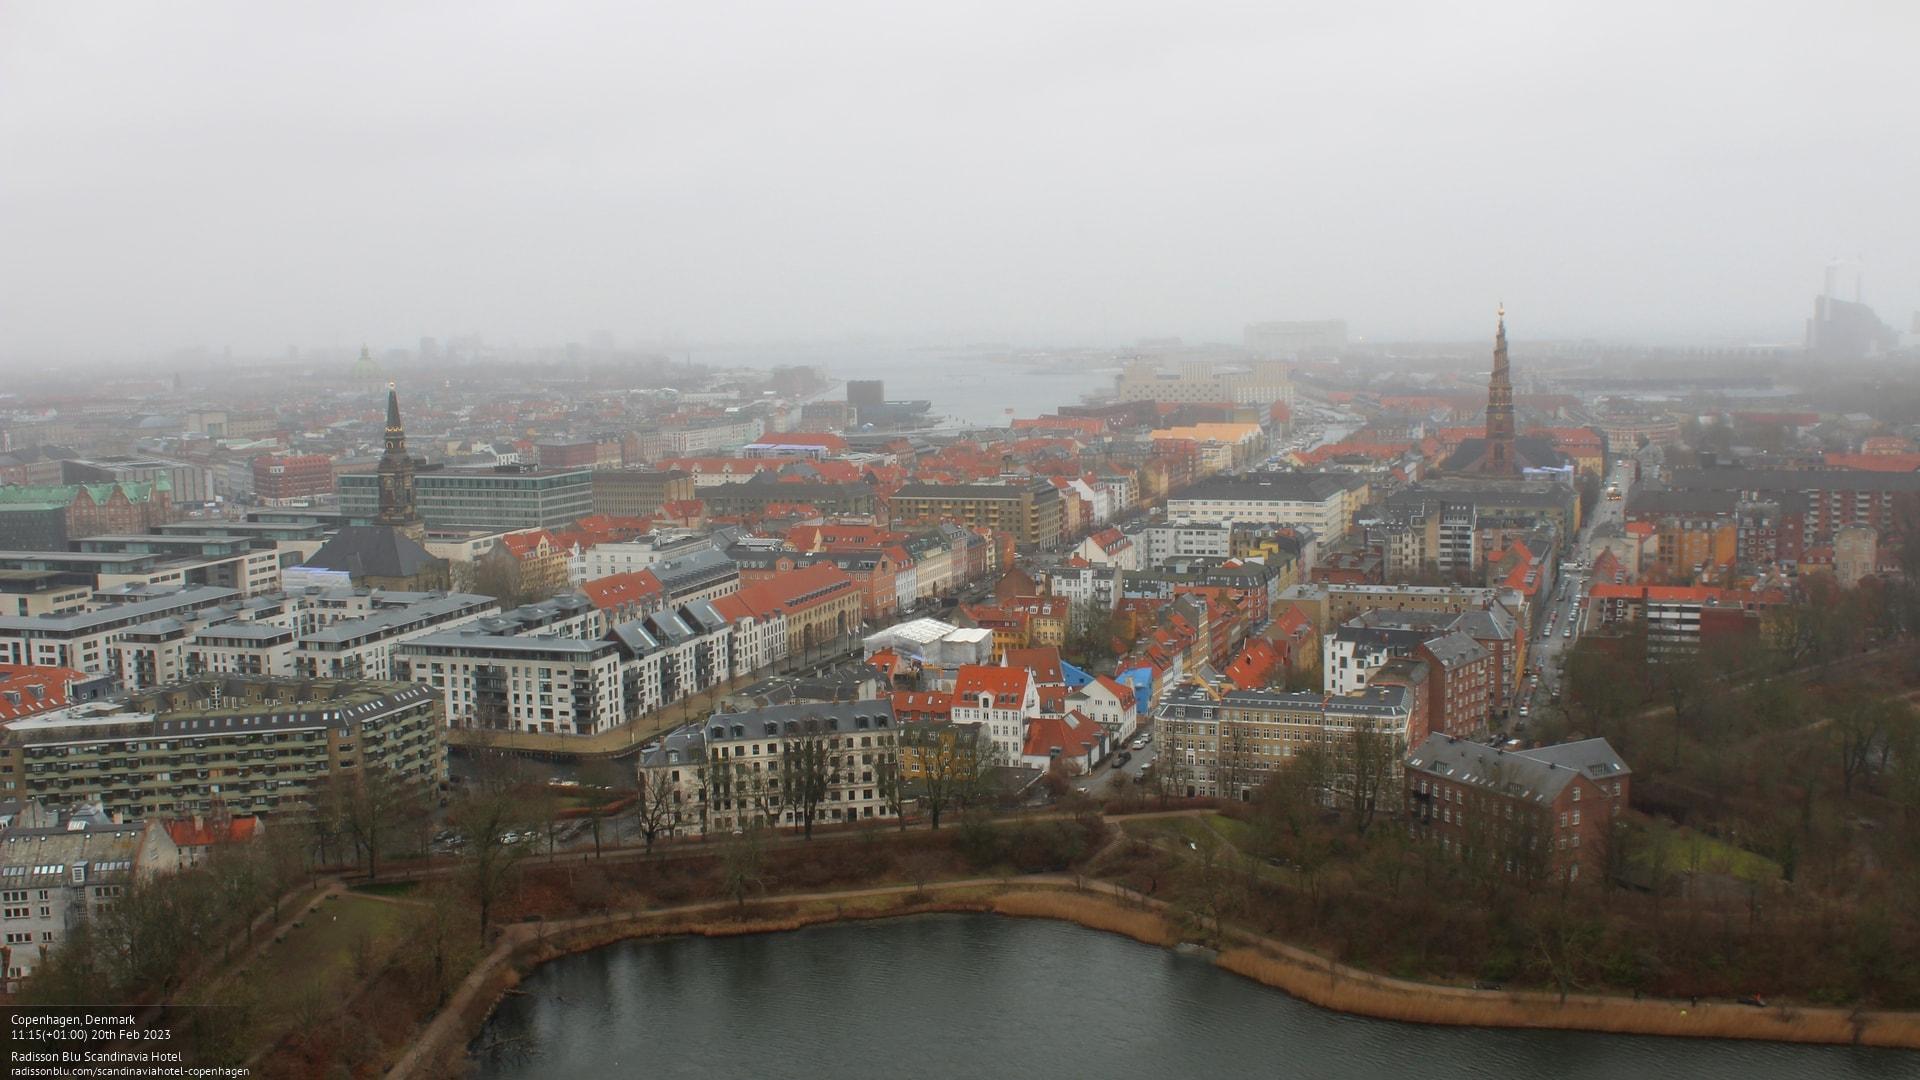 Webkamera Copenhagen: Radisson Blu Scandinavia Hotel